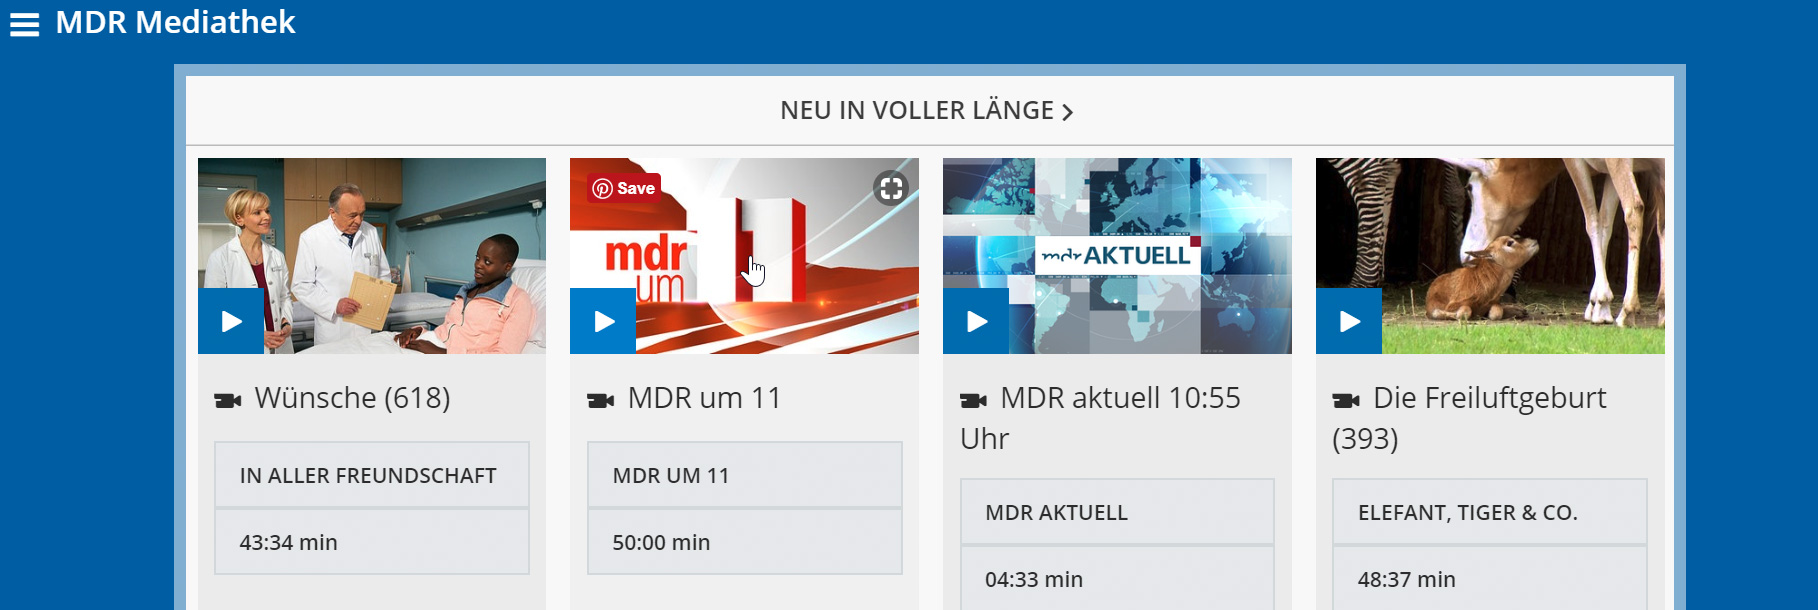 Mdr Mediathek Sendung Verpasst So Seht Ihr Sie Online Kinode